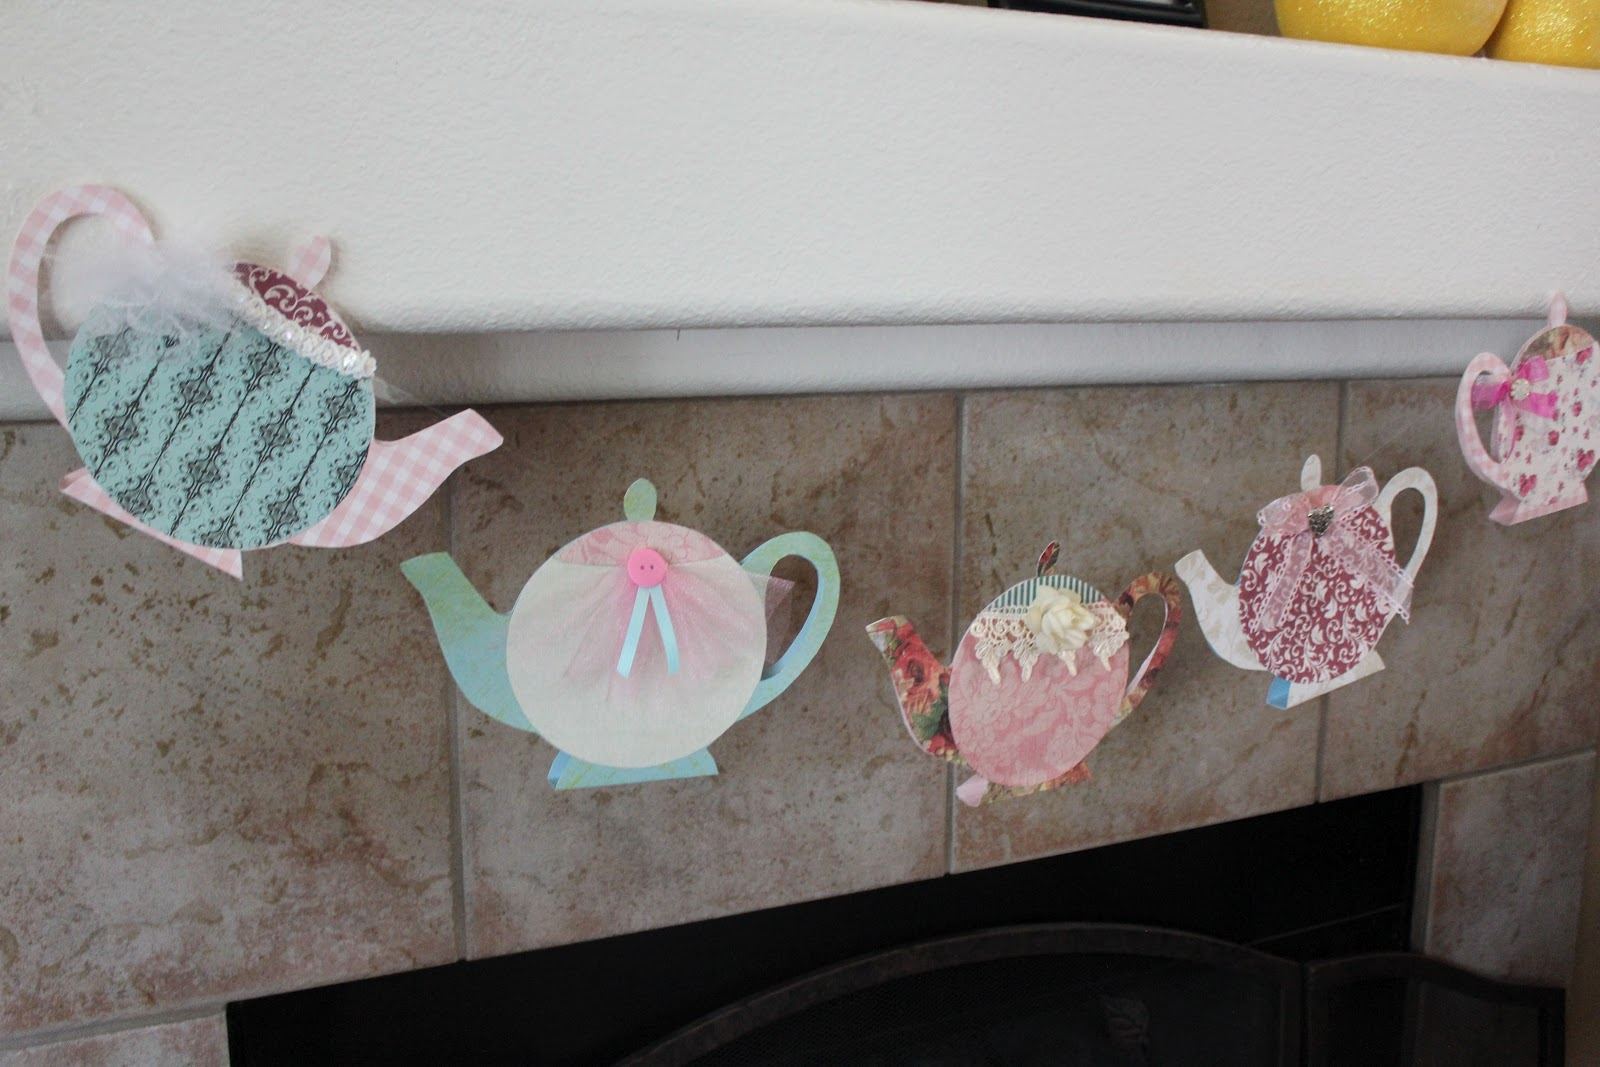 Scrapbook paper craft ideas - Scrapbook Paper Craft Ideas 57